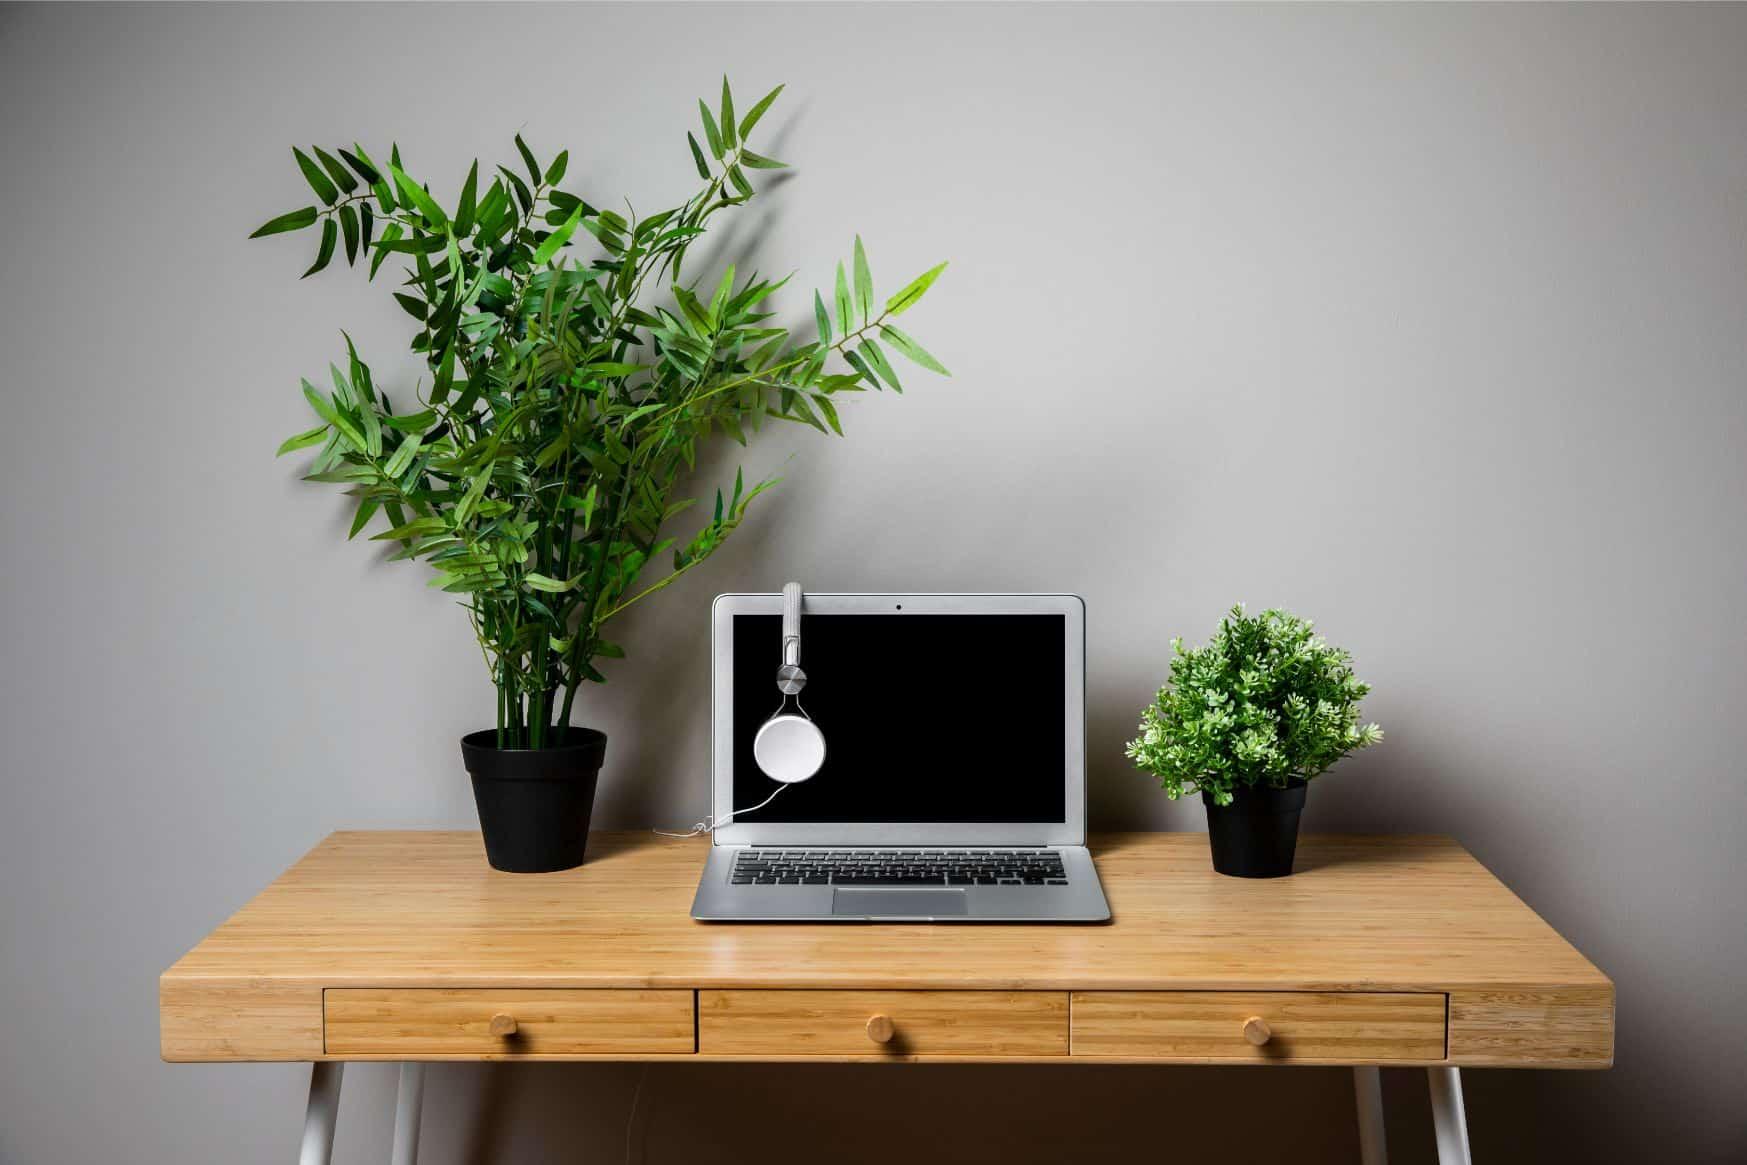 garden-home-office-essentials-5-greenery-freepik